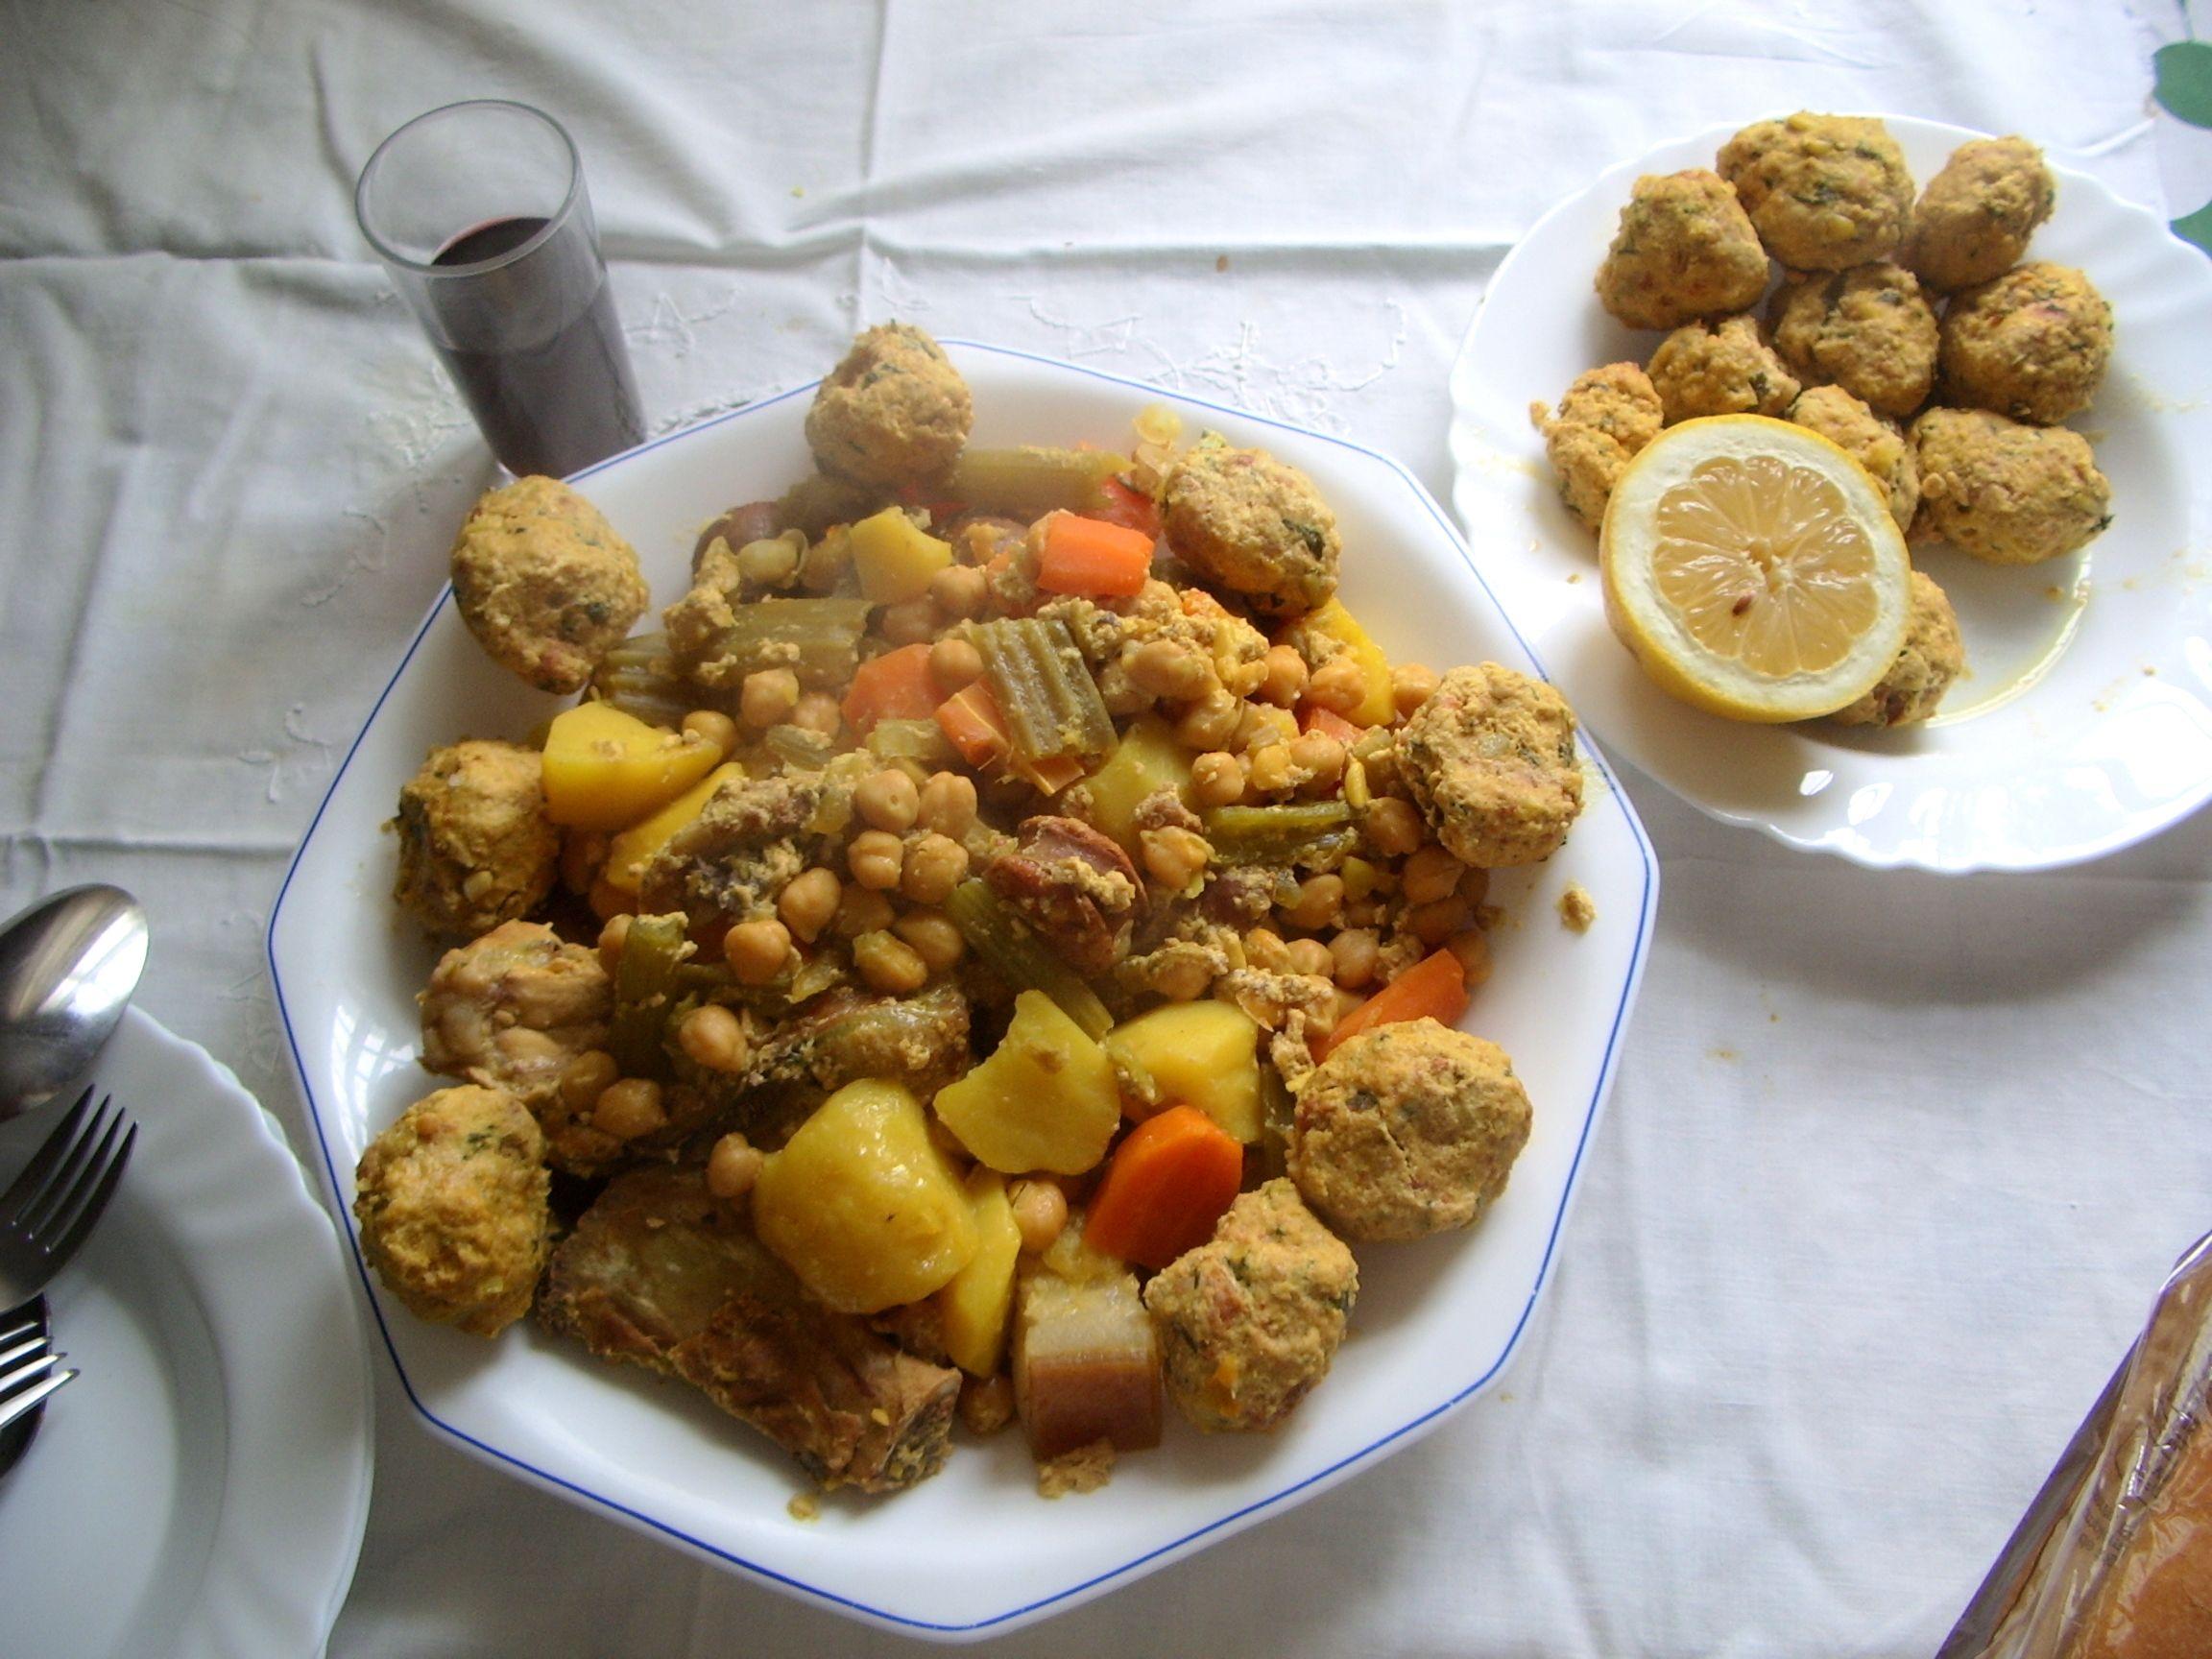 Cocido con pelotas plato t pico de orihuela alicante spain - Cocina navidena espanola ...